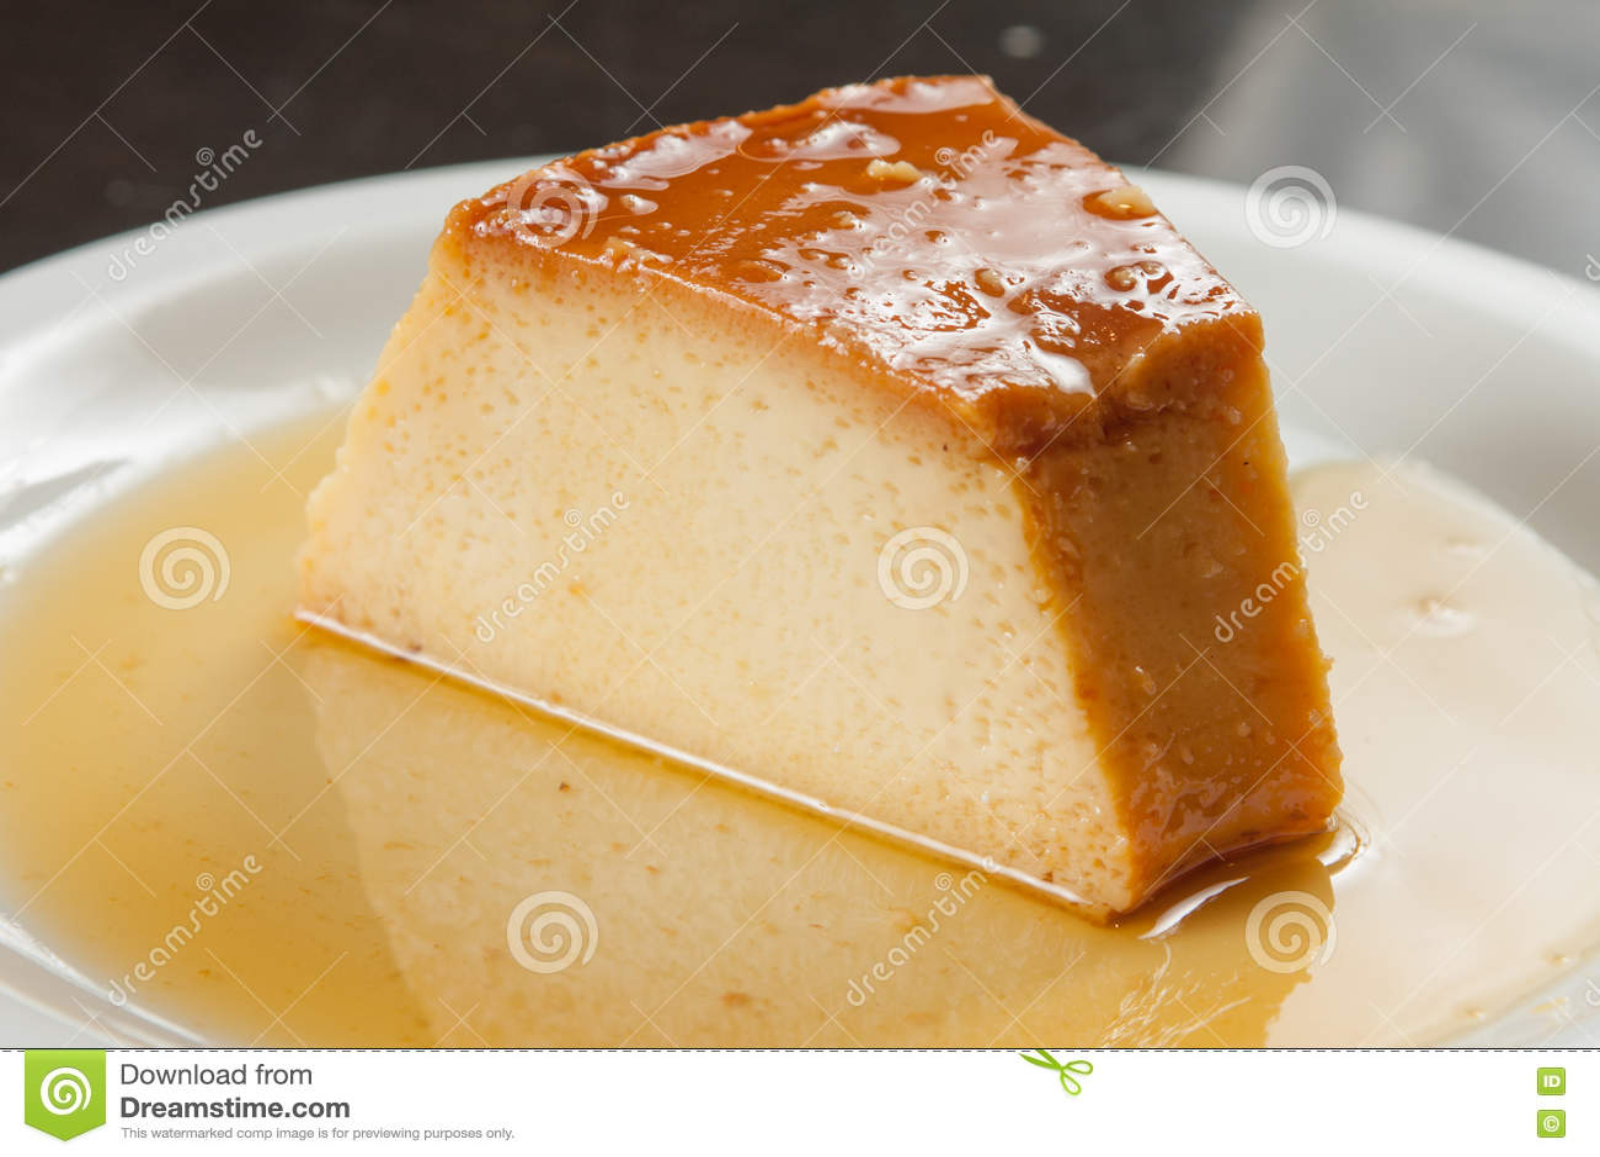 Slice of Milk Pudding